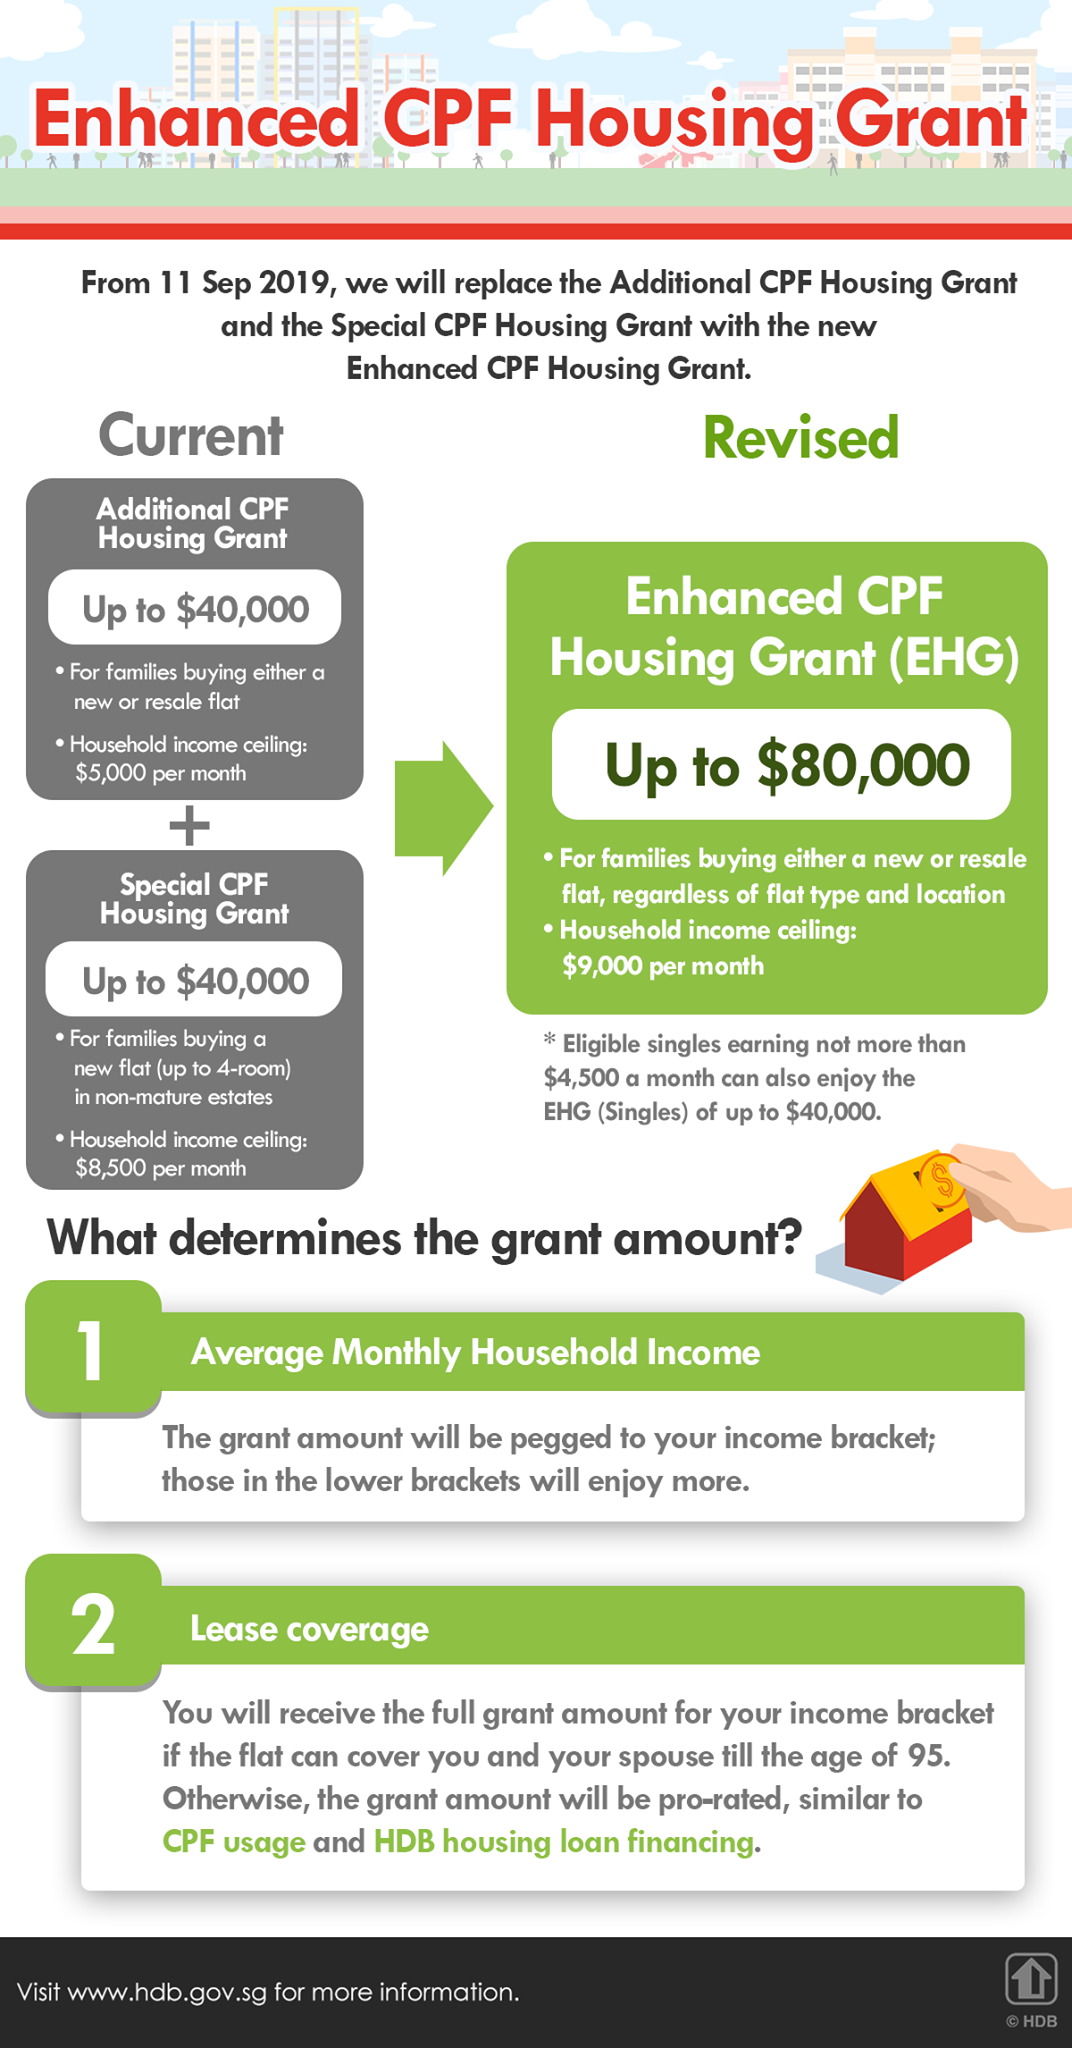 EHG - Enhanced CPF Housing Grant 6